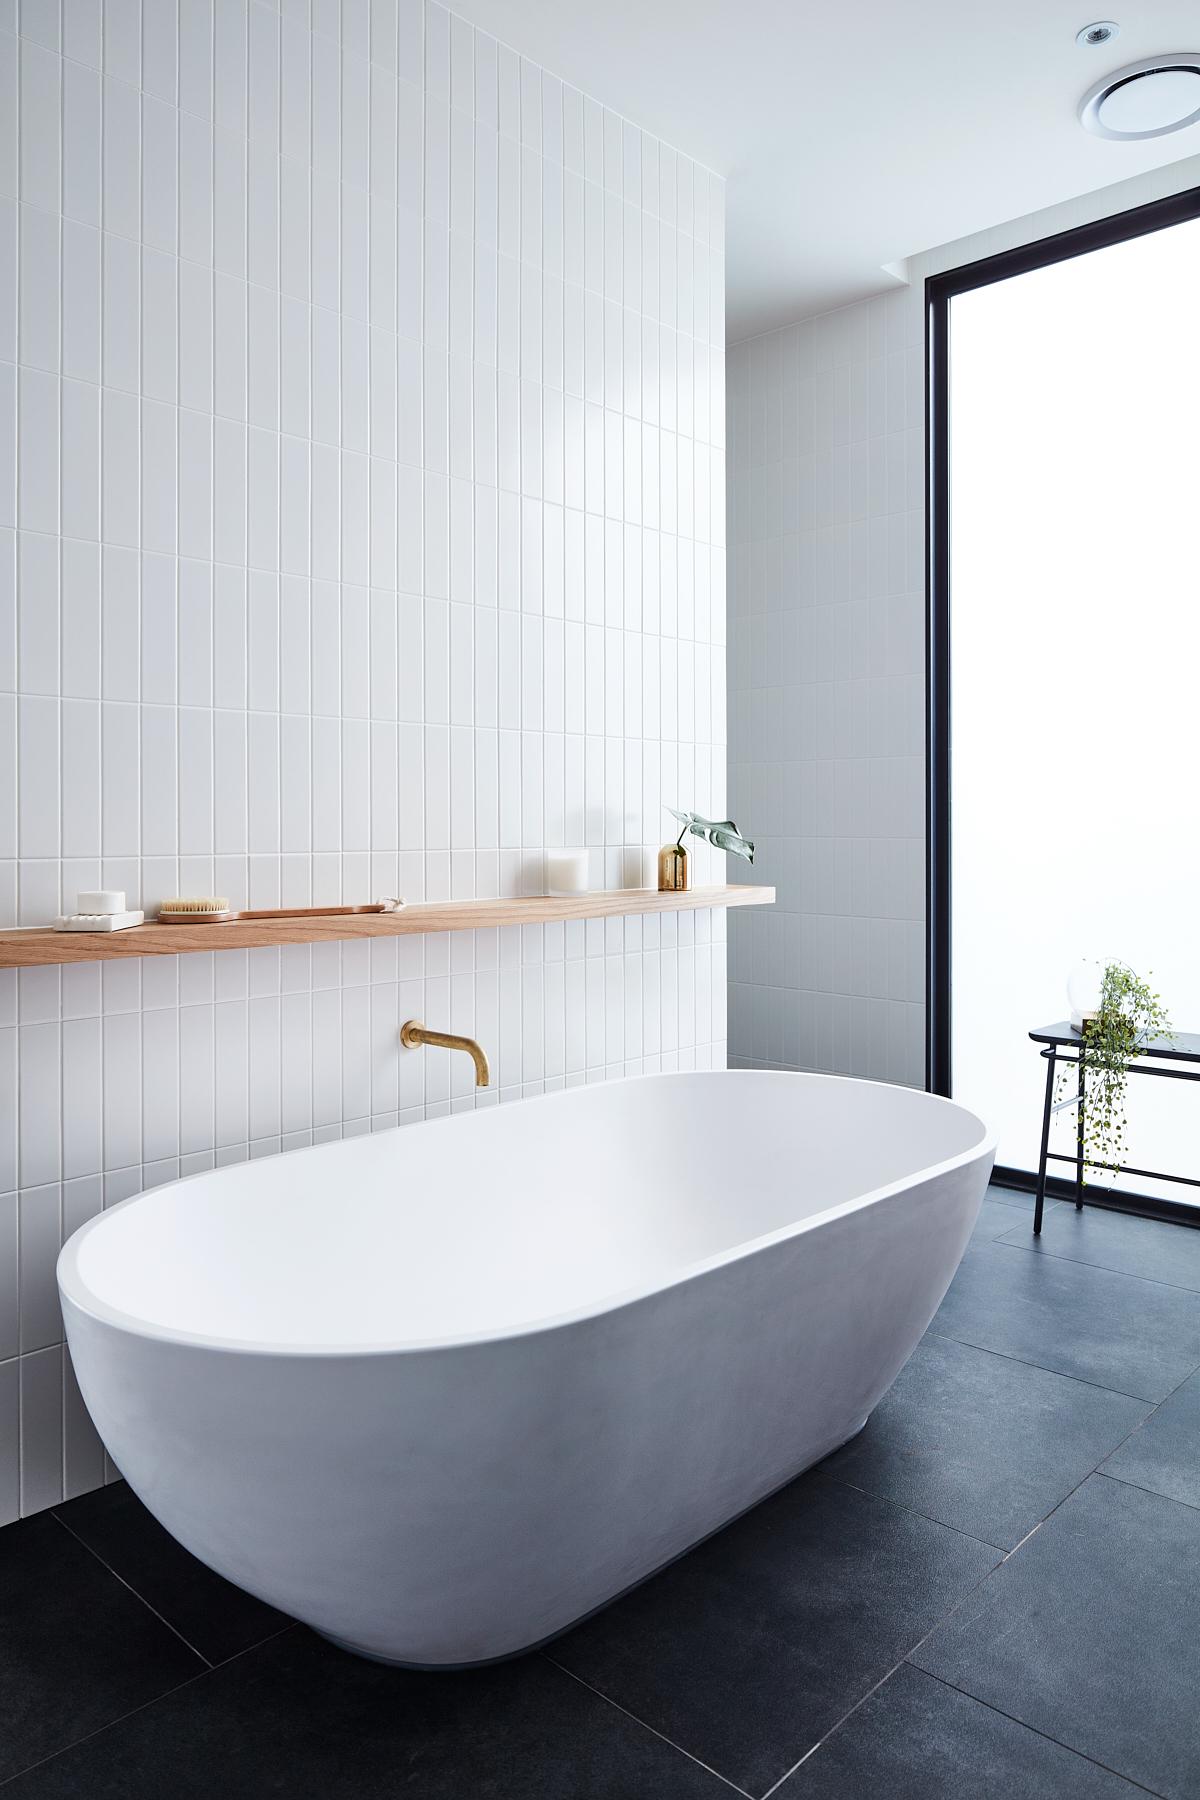 Lifespaces-Courtyardhouse-Kascade-Bath